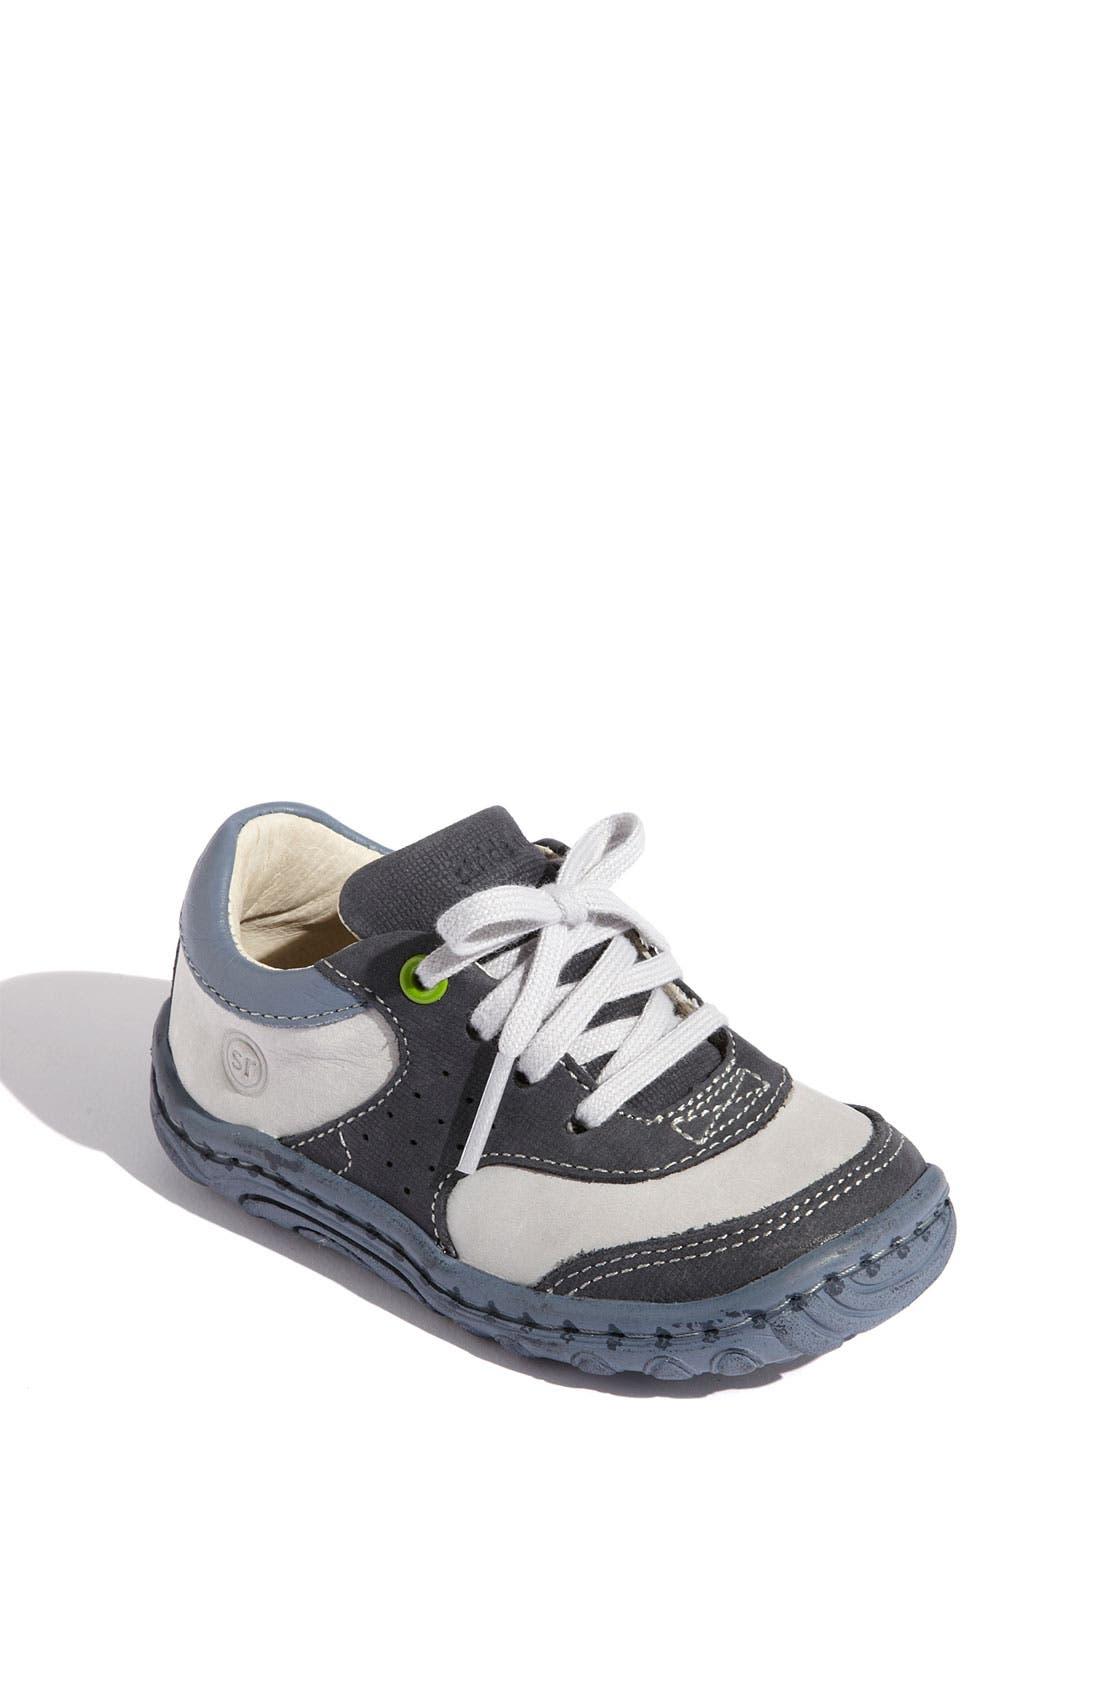 Alternate Image 1 Selected - Stride Rite 'Charles' Sneaker (Baby, Walker & Toddler)